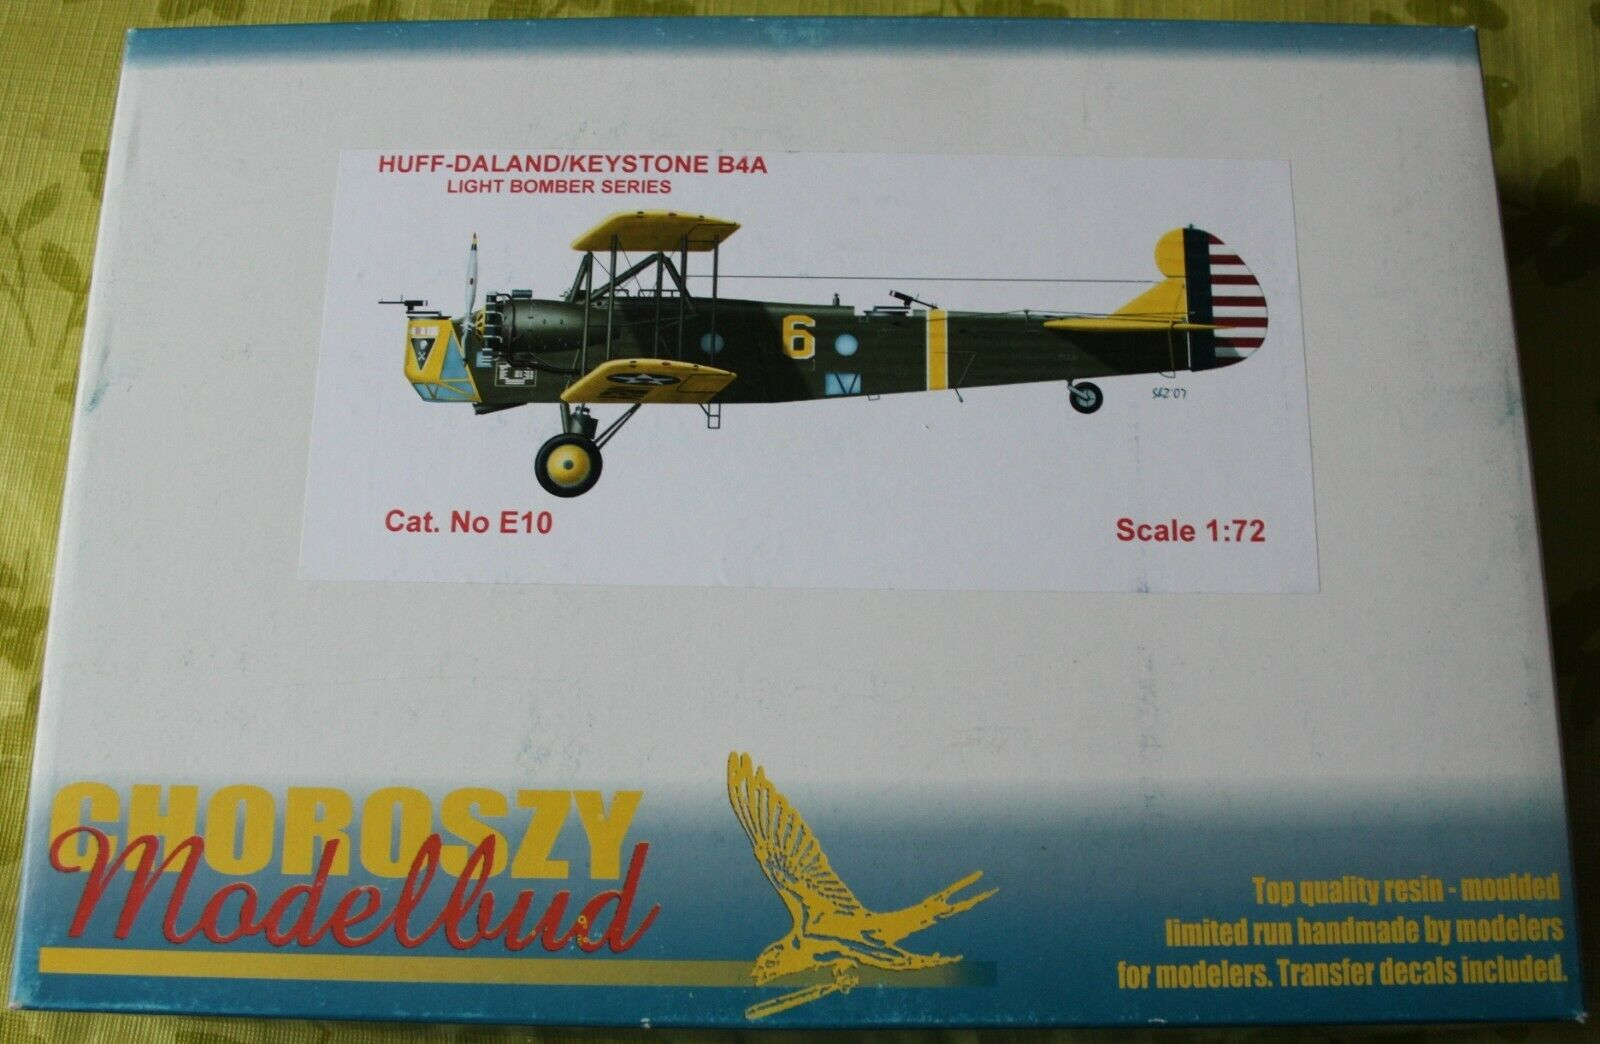 E10-HUFF-DALAND KEYSTONE B4A-LIGHT BOMBER SERIES-Chgoldszy Modelbud-1 72